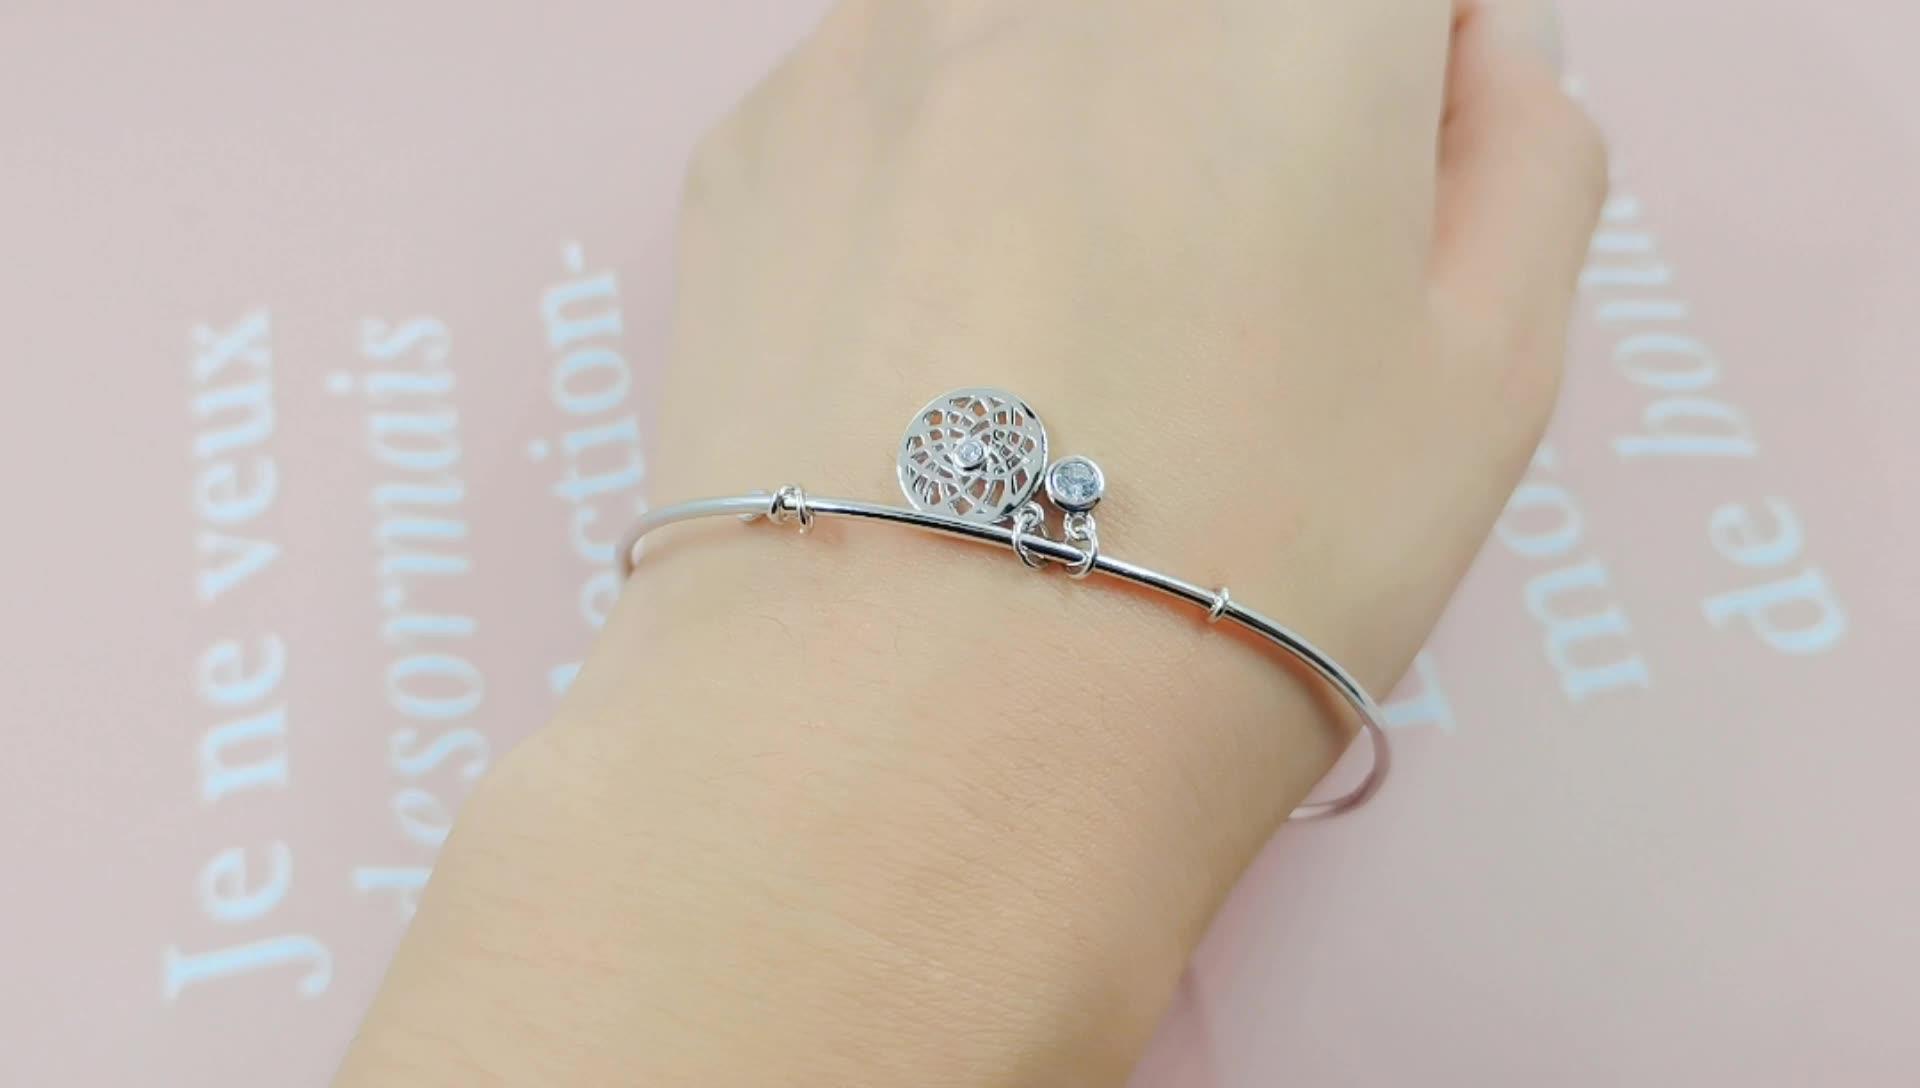 Hip hop style women men sterling silver jewelry bangle for season flower pendant charm bangle